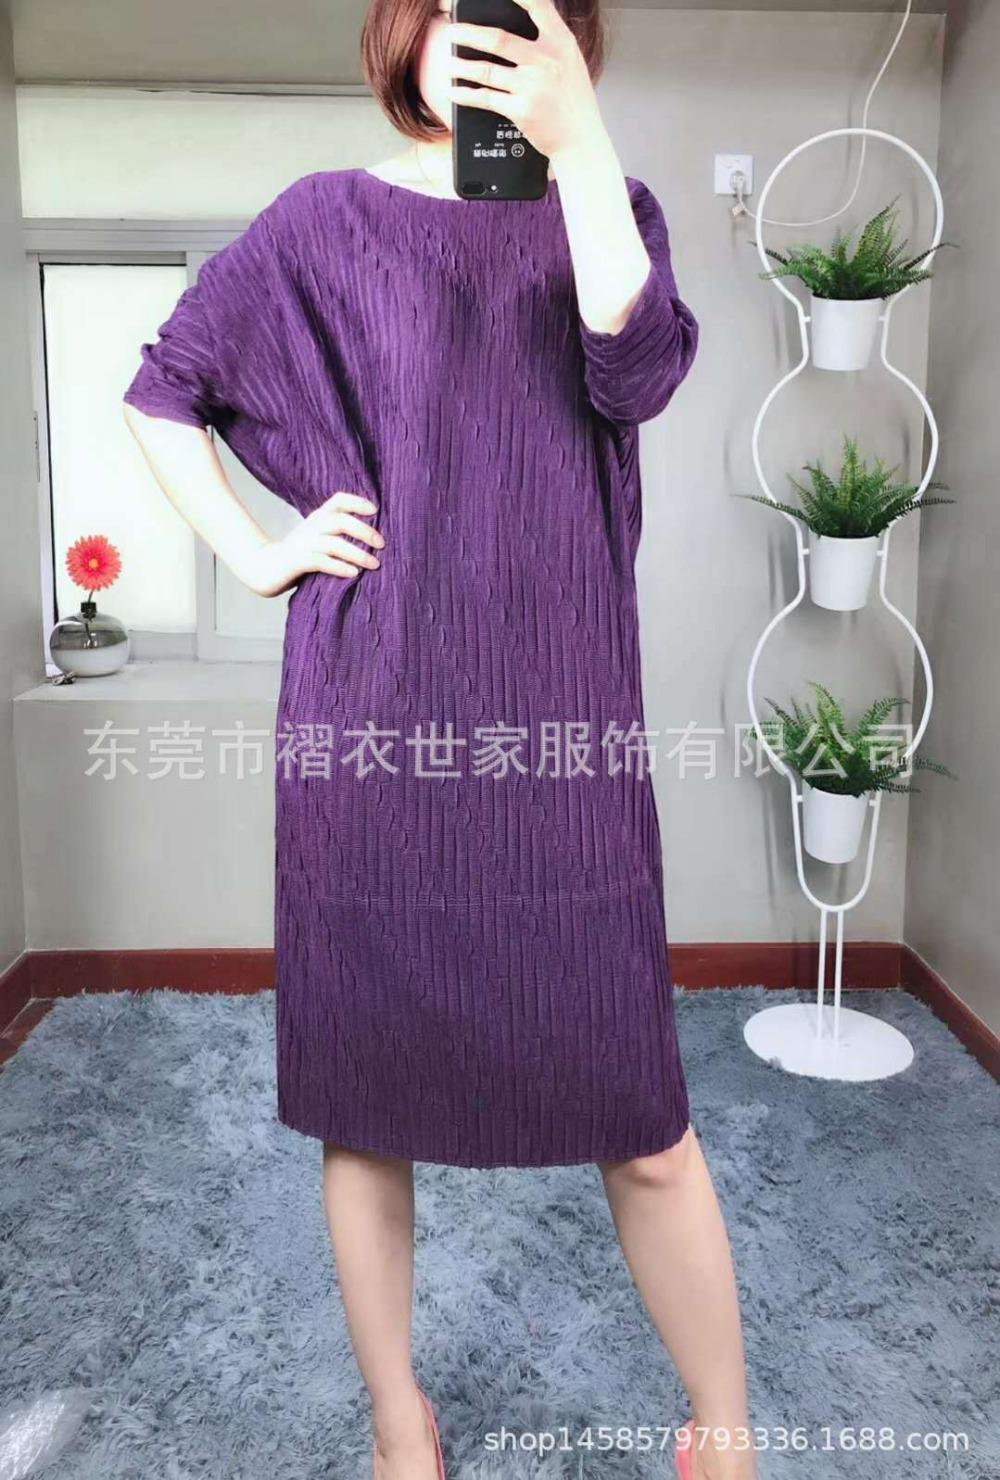 HOT SELLING Miyake Fashion fold o-neck half sleeve Embossed loose batwing sleeve dress IN STOCK 1